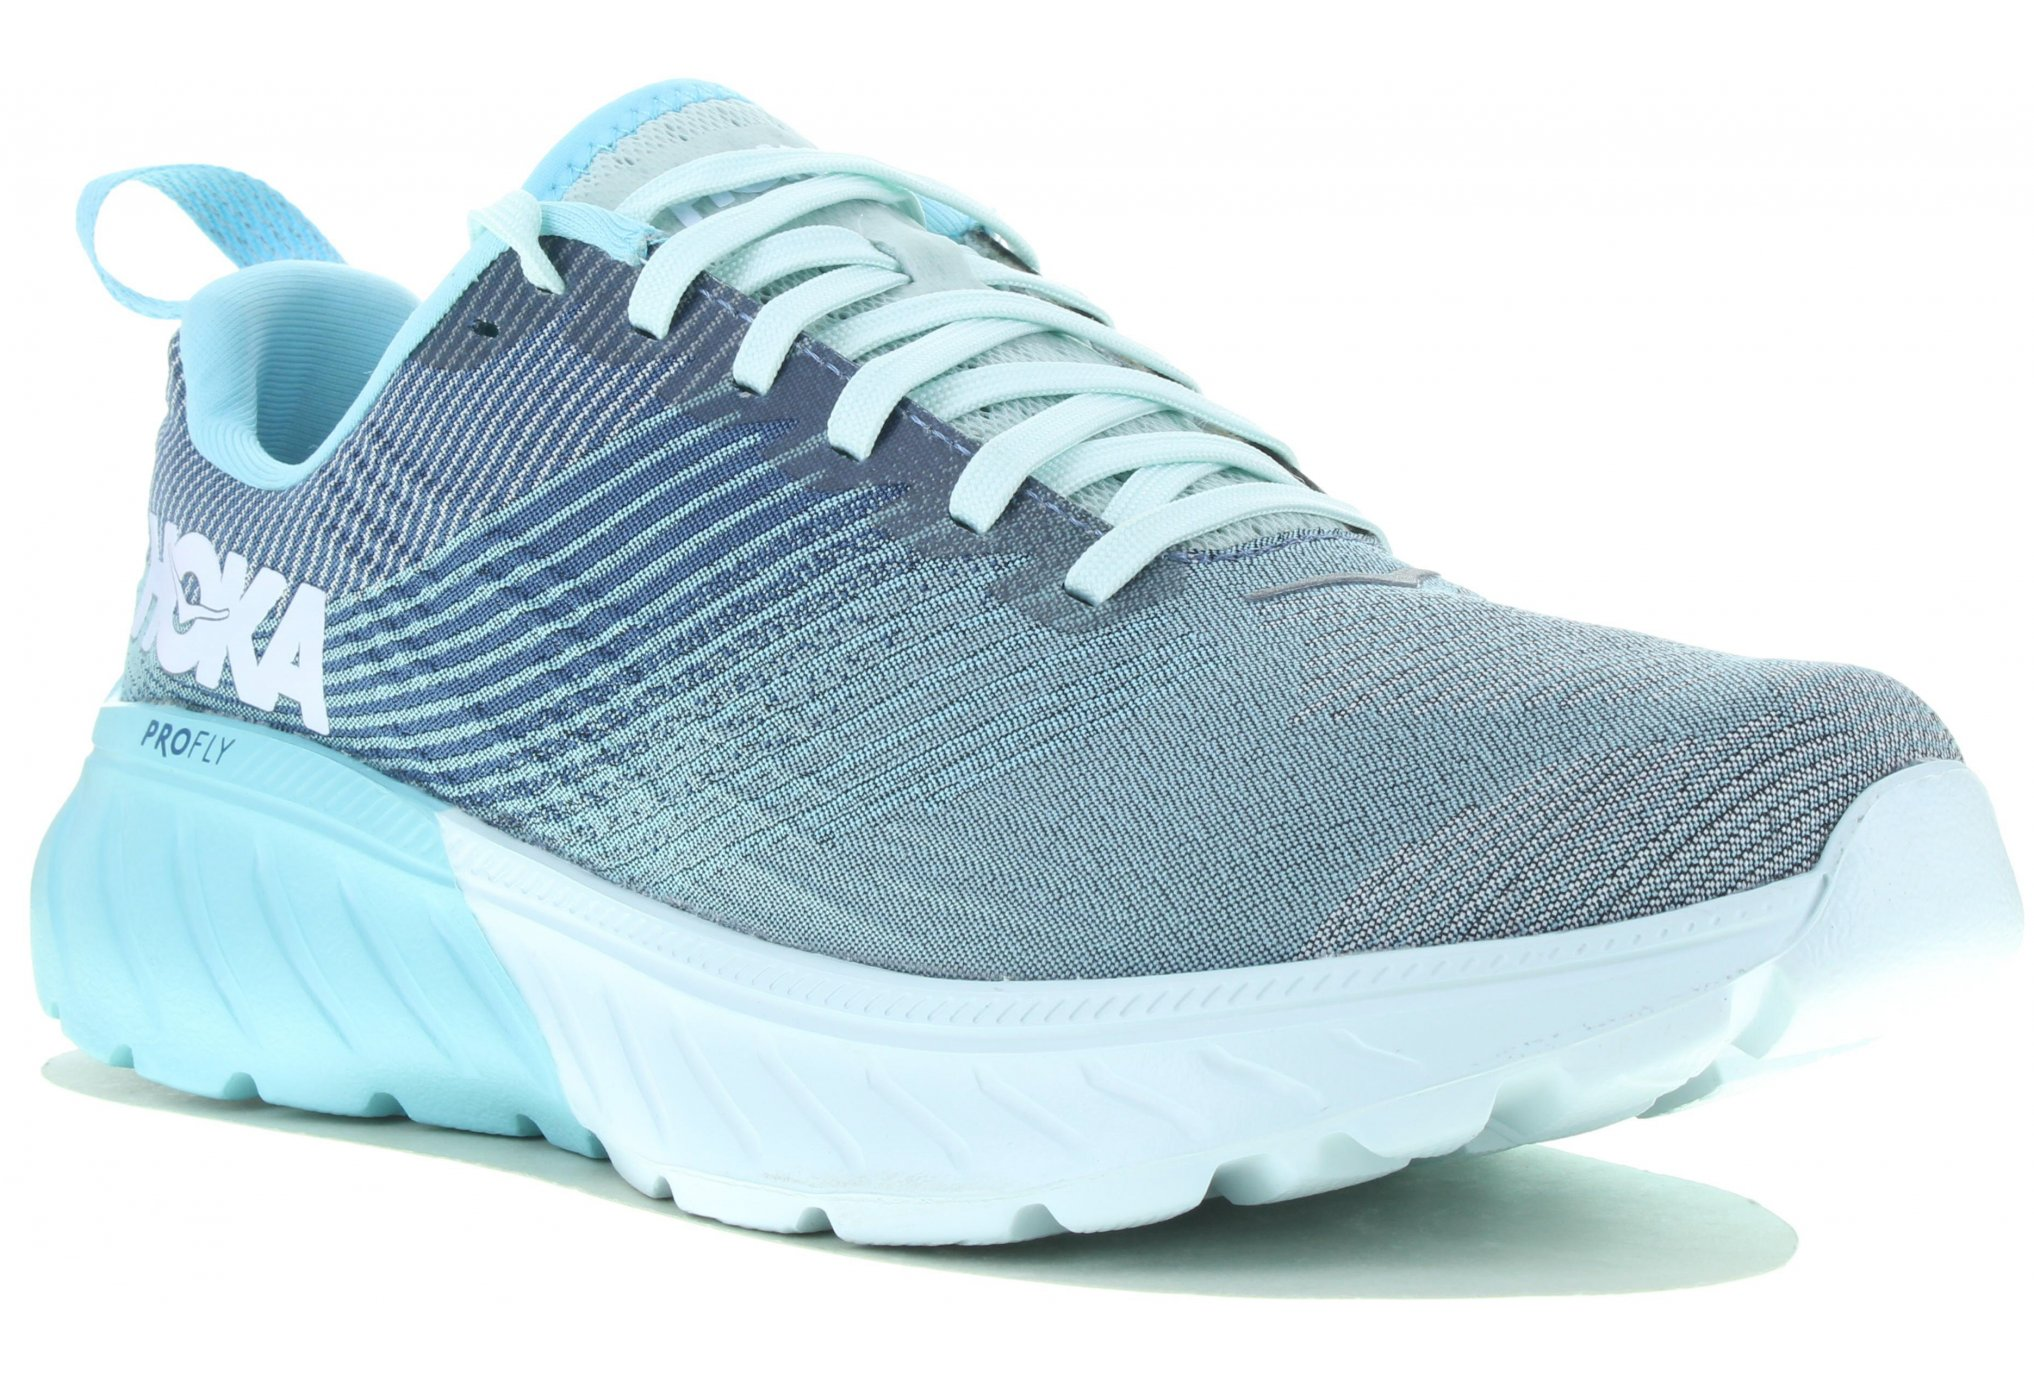 Hoka One One Mach 3 Chaussures running femme